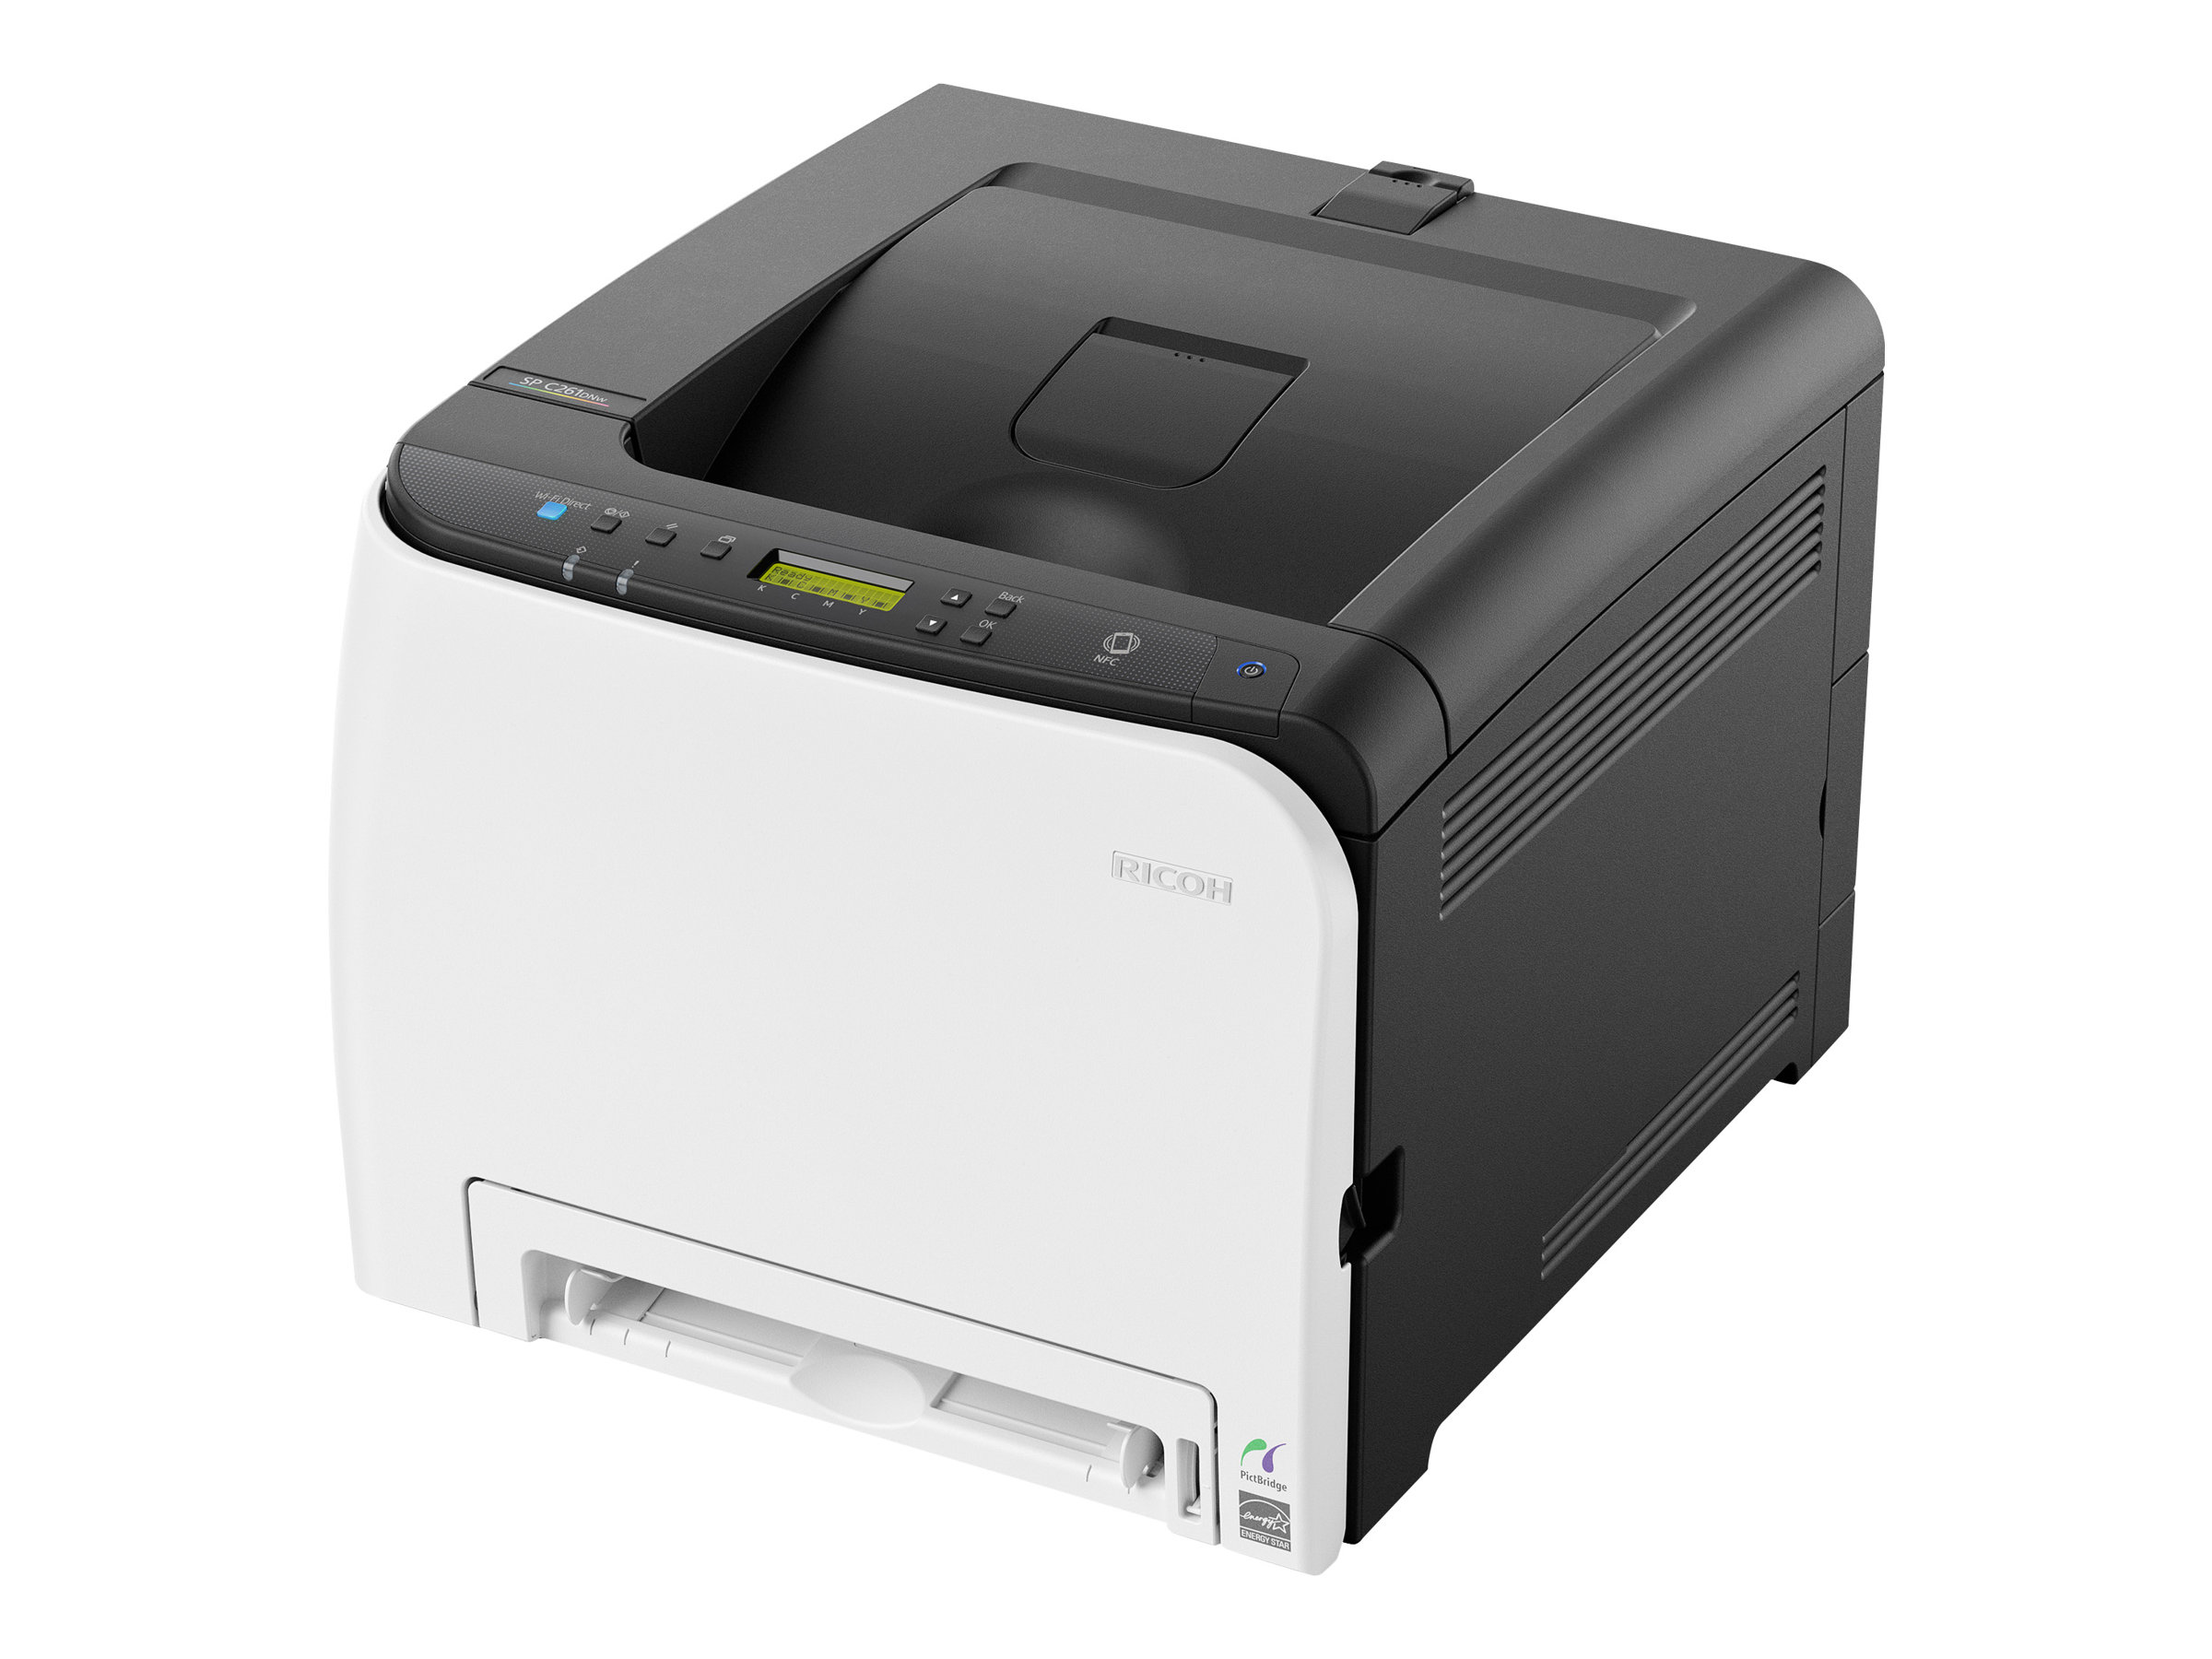 Ricoh SP C261DNw - Drucker - Farbe - Duplex - Laser - A4/Legal